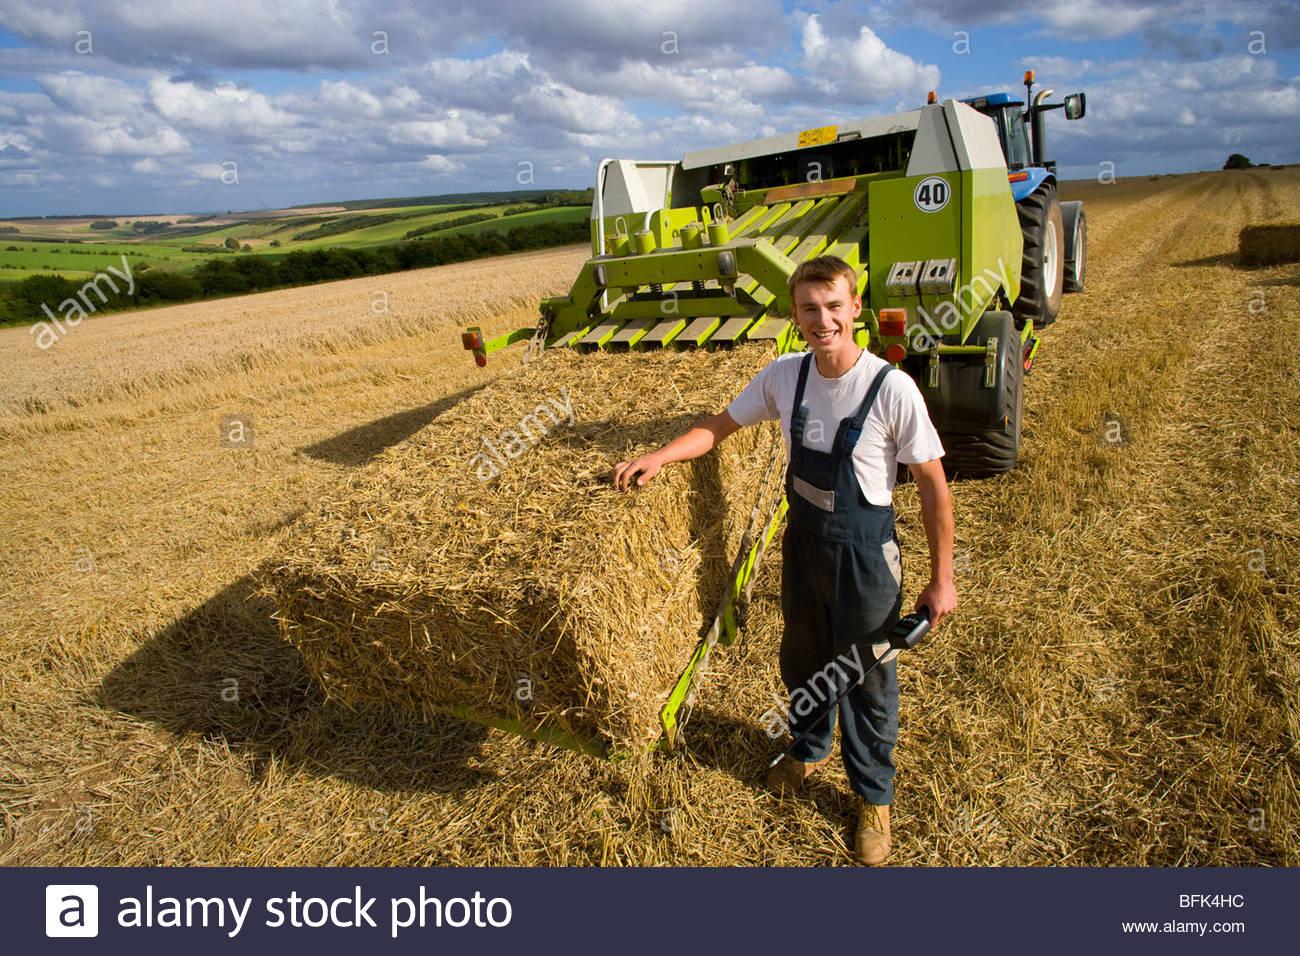 Farmer holding moisture reading equipment next to straw bale on baler in rural field - Stock Image